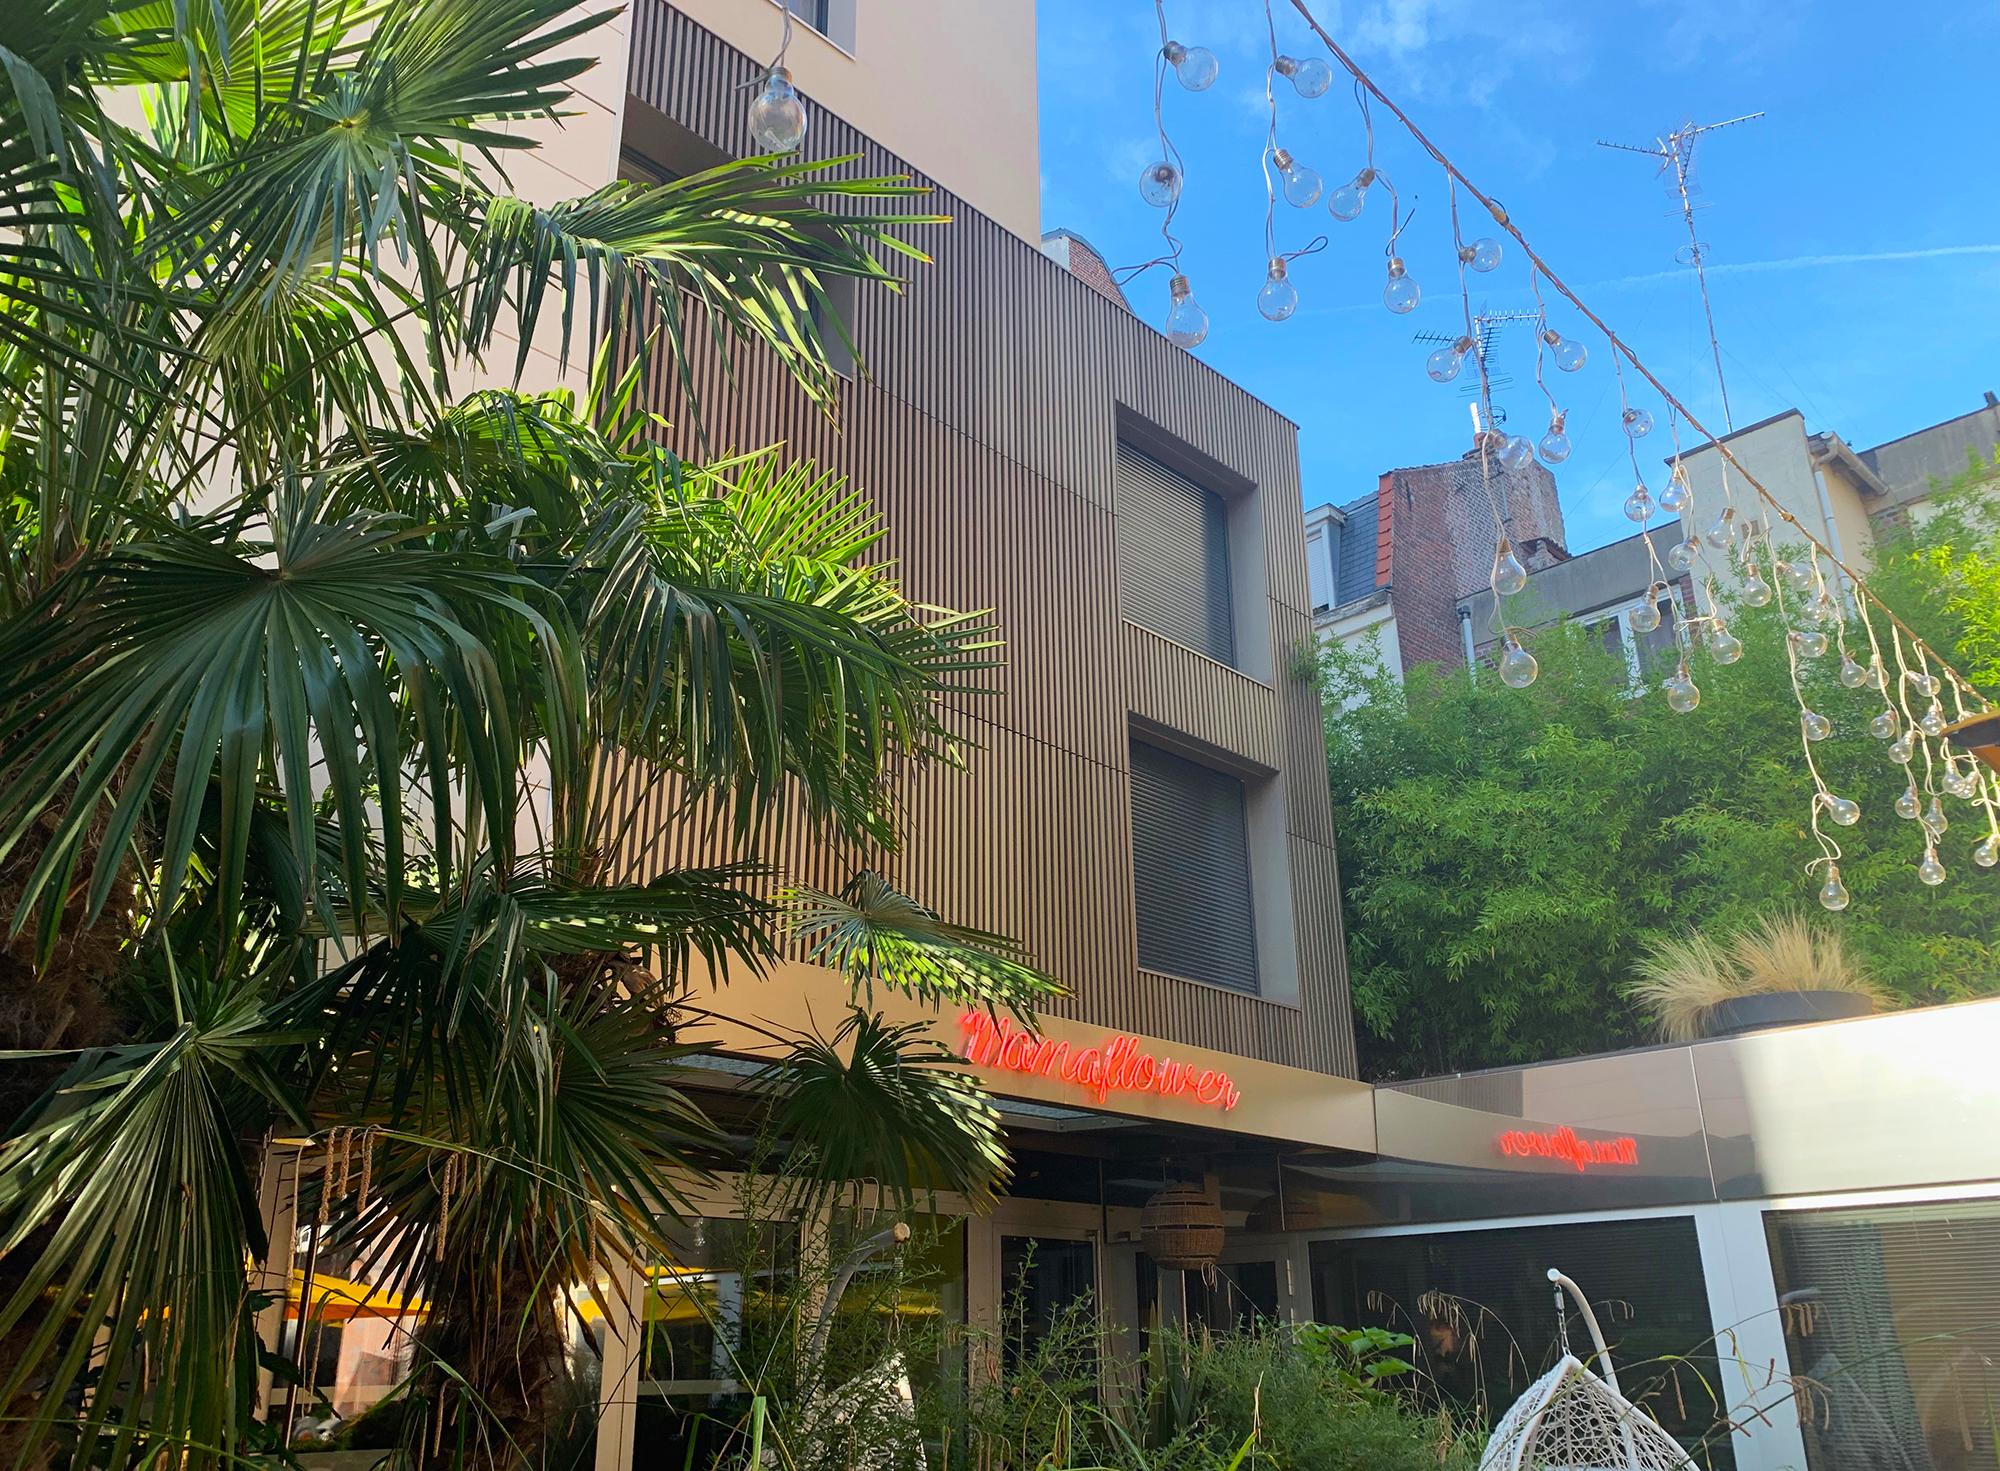 avis hotels, les meilleurs hotels de luxe